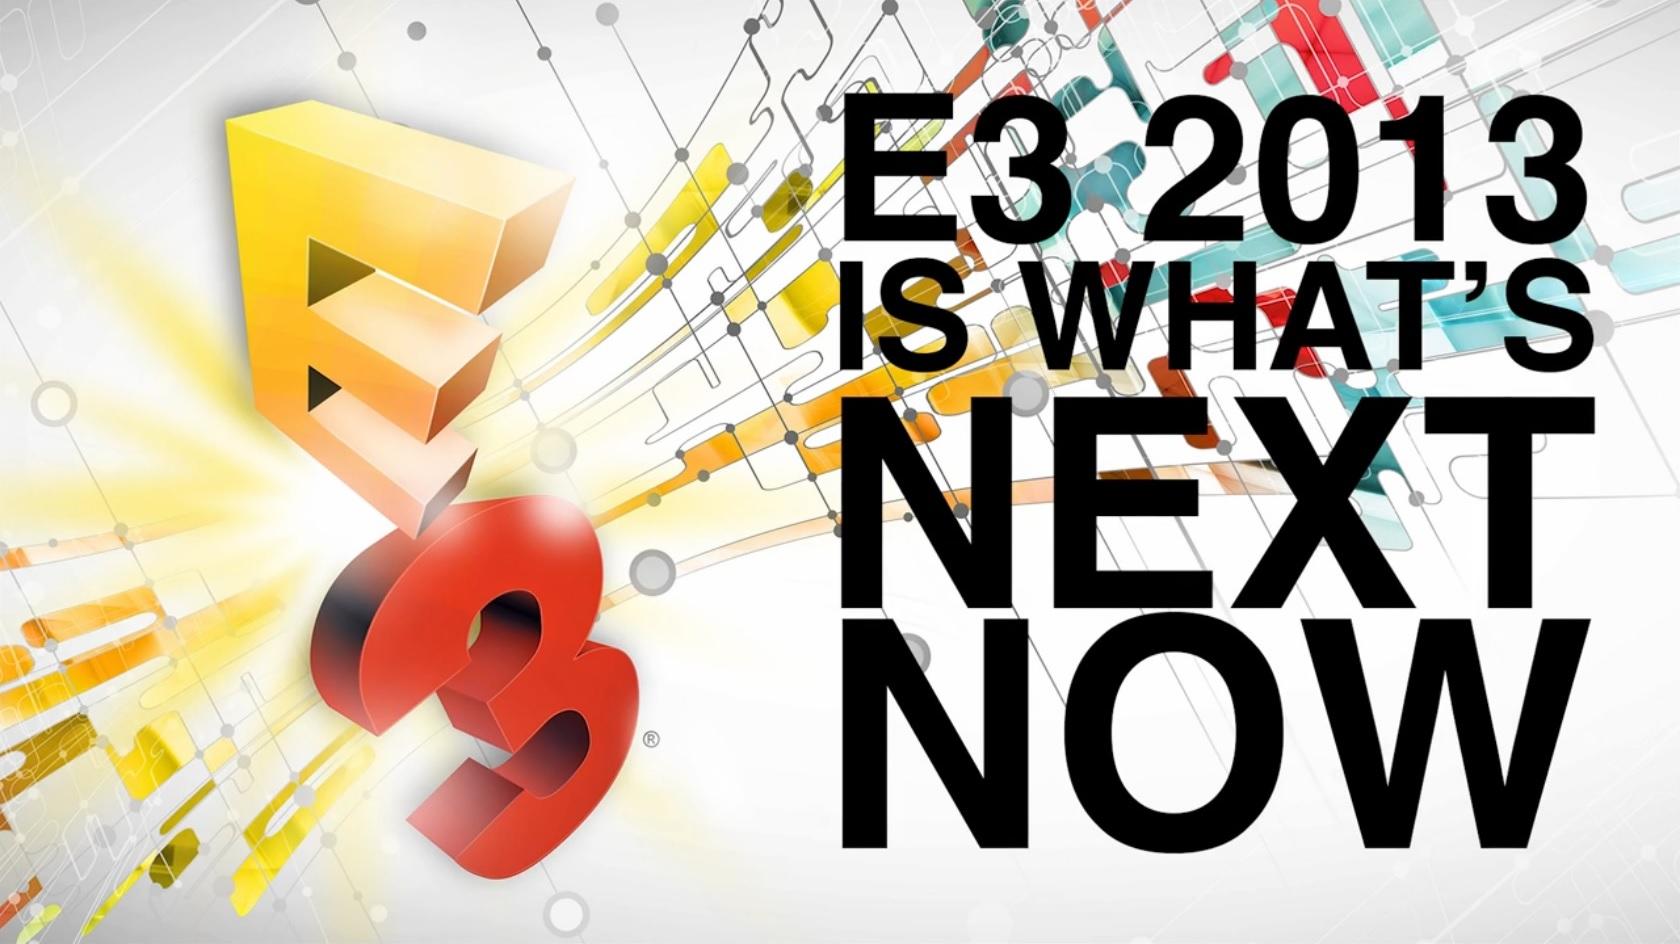 Pure Nintendo: E3 2013 in pictures